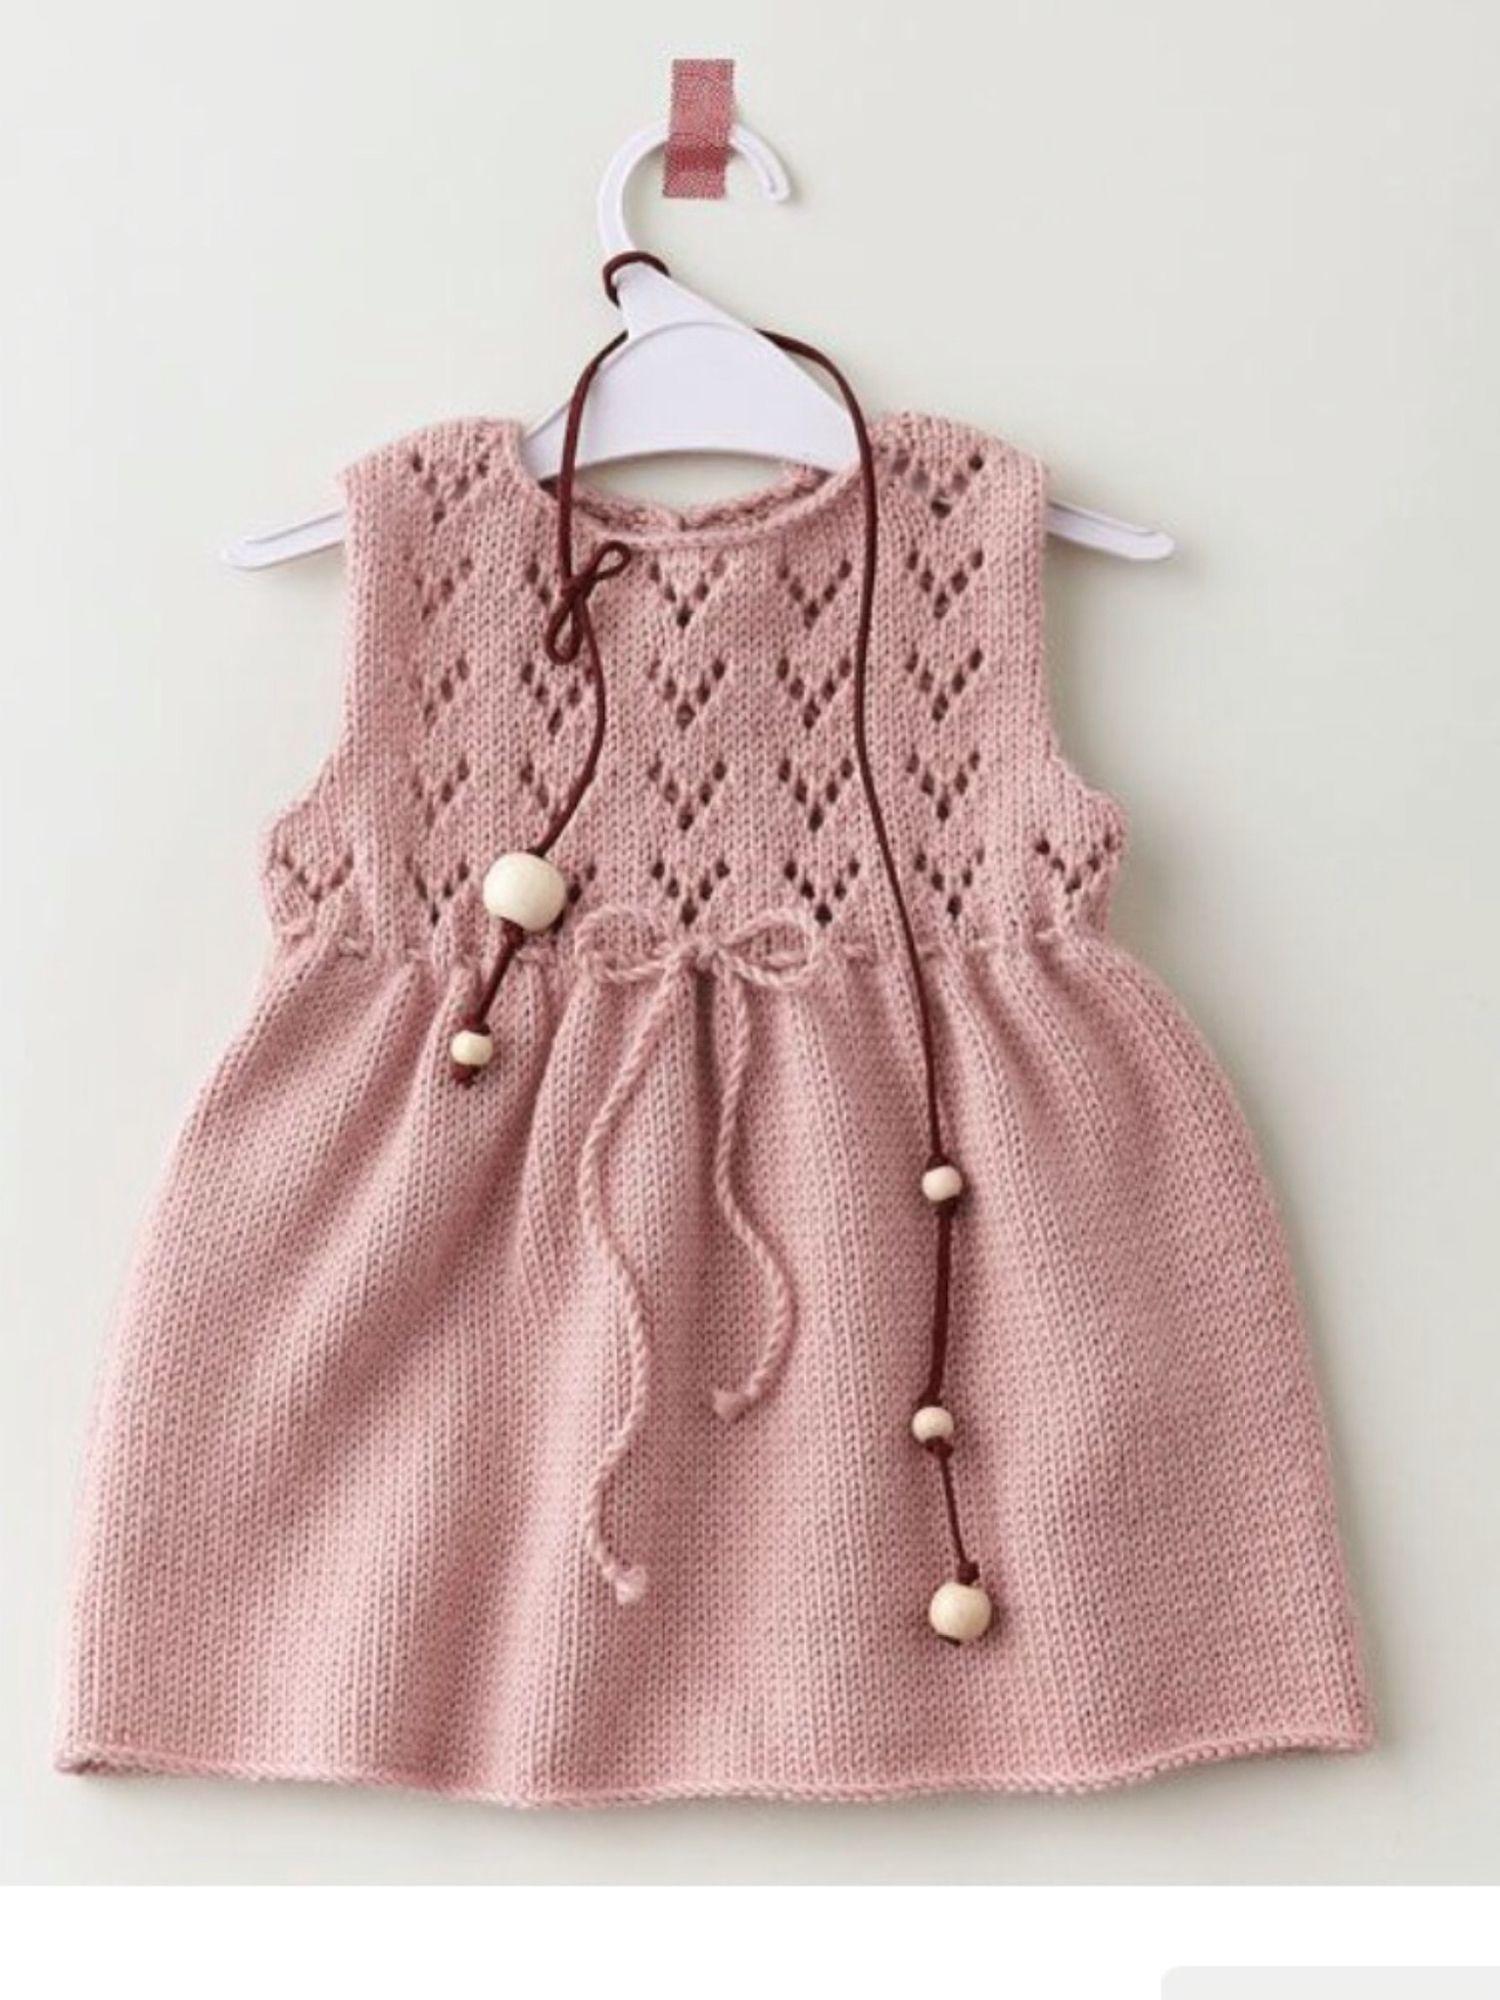 Elbise | Çocuk örgüleri | Pinterest | Stricken, Kinderkleidung und ...